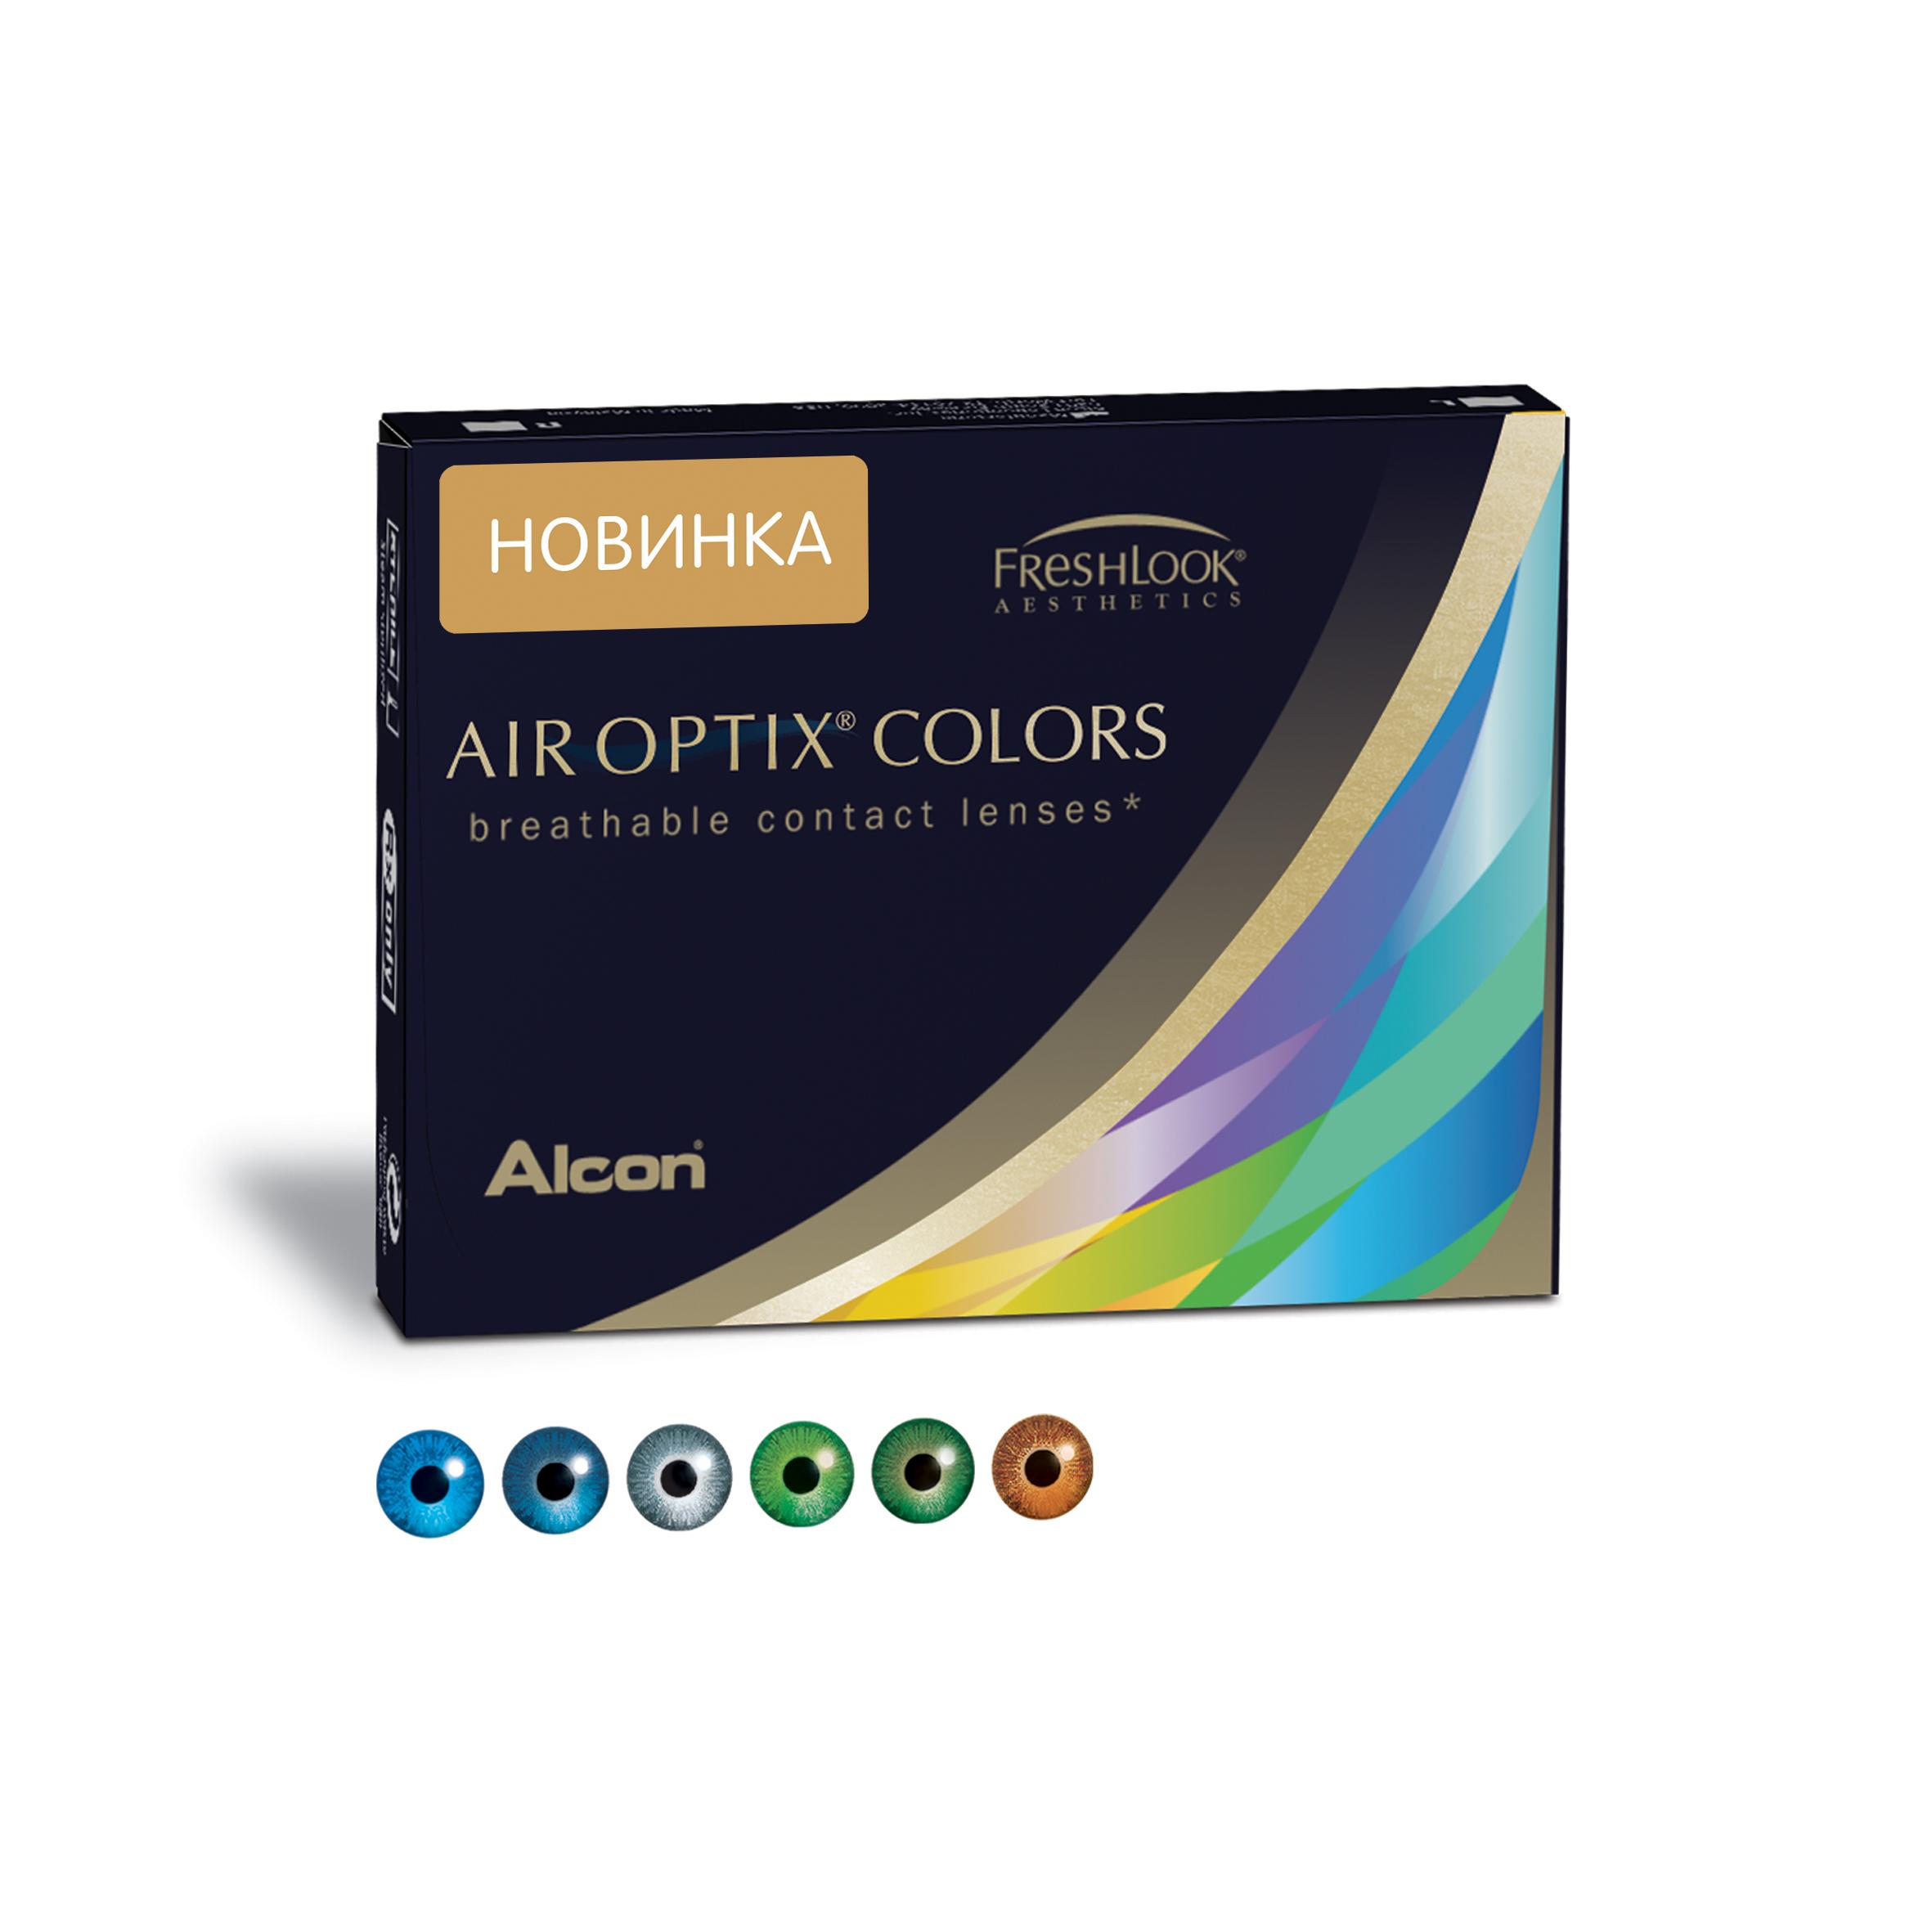 Аlcon контактные линзы Air Optix Colors 2 шт -2.50 Honey31746181Мягкие контактные линзы